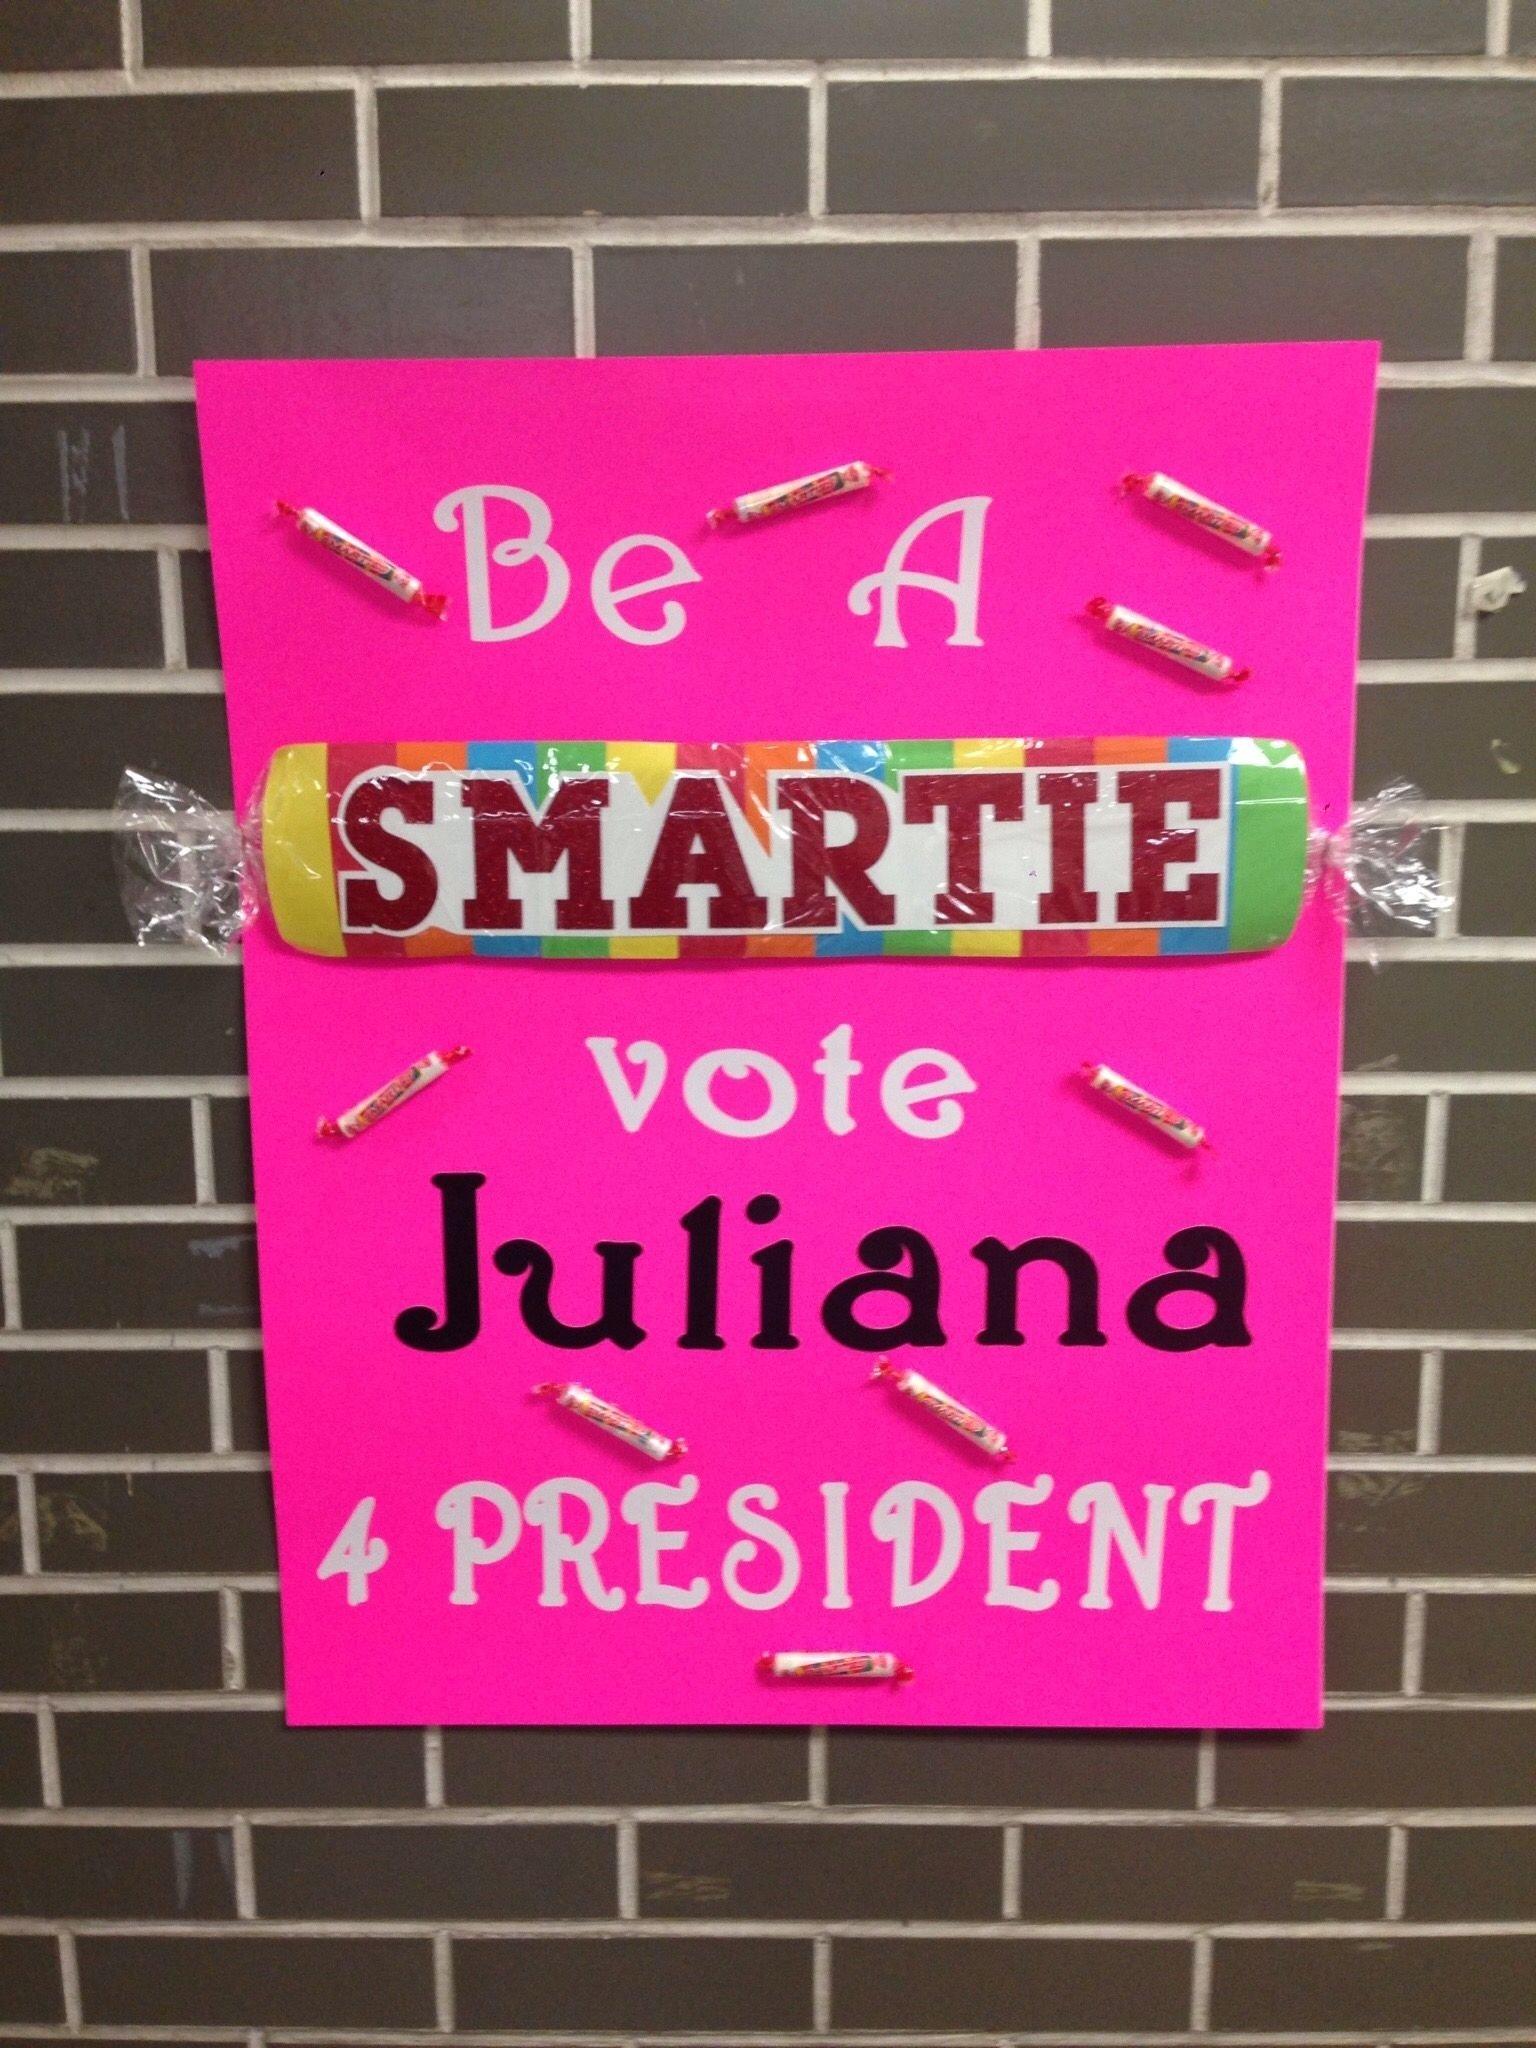 10 Unique Student Council President Poster Ideas student council election poster juliana pinterest students 4 2021